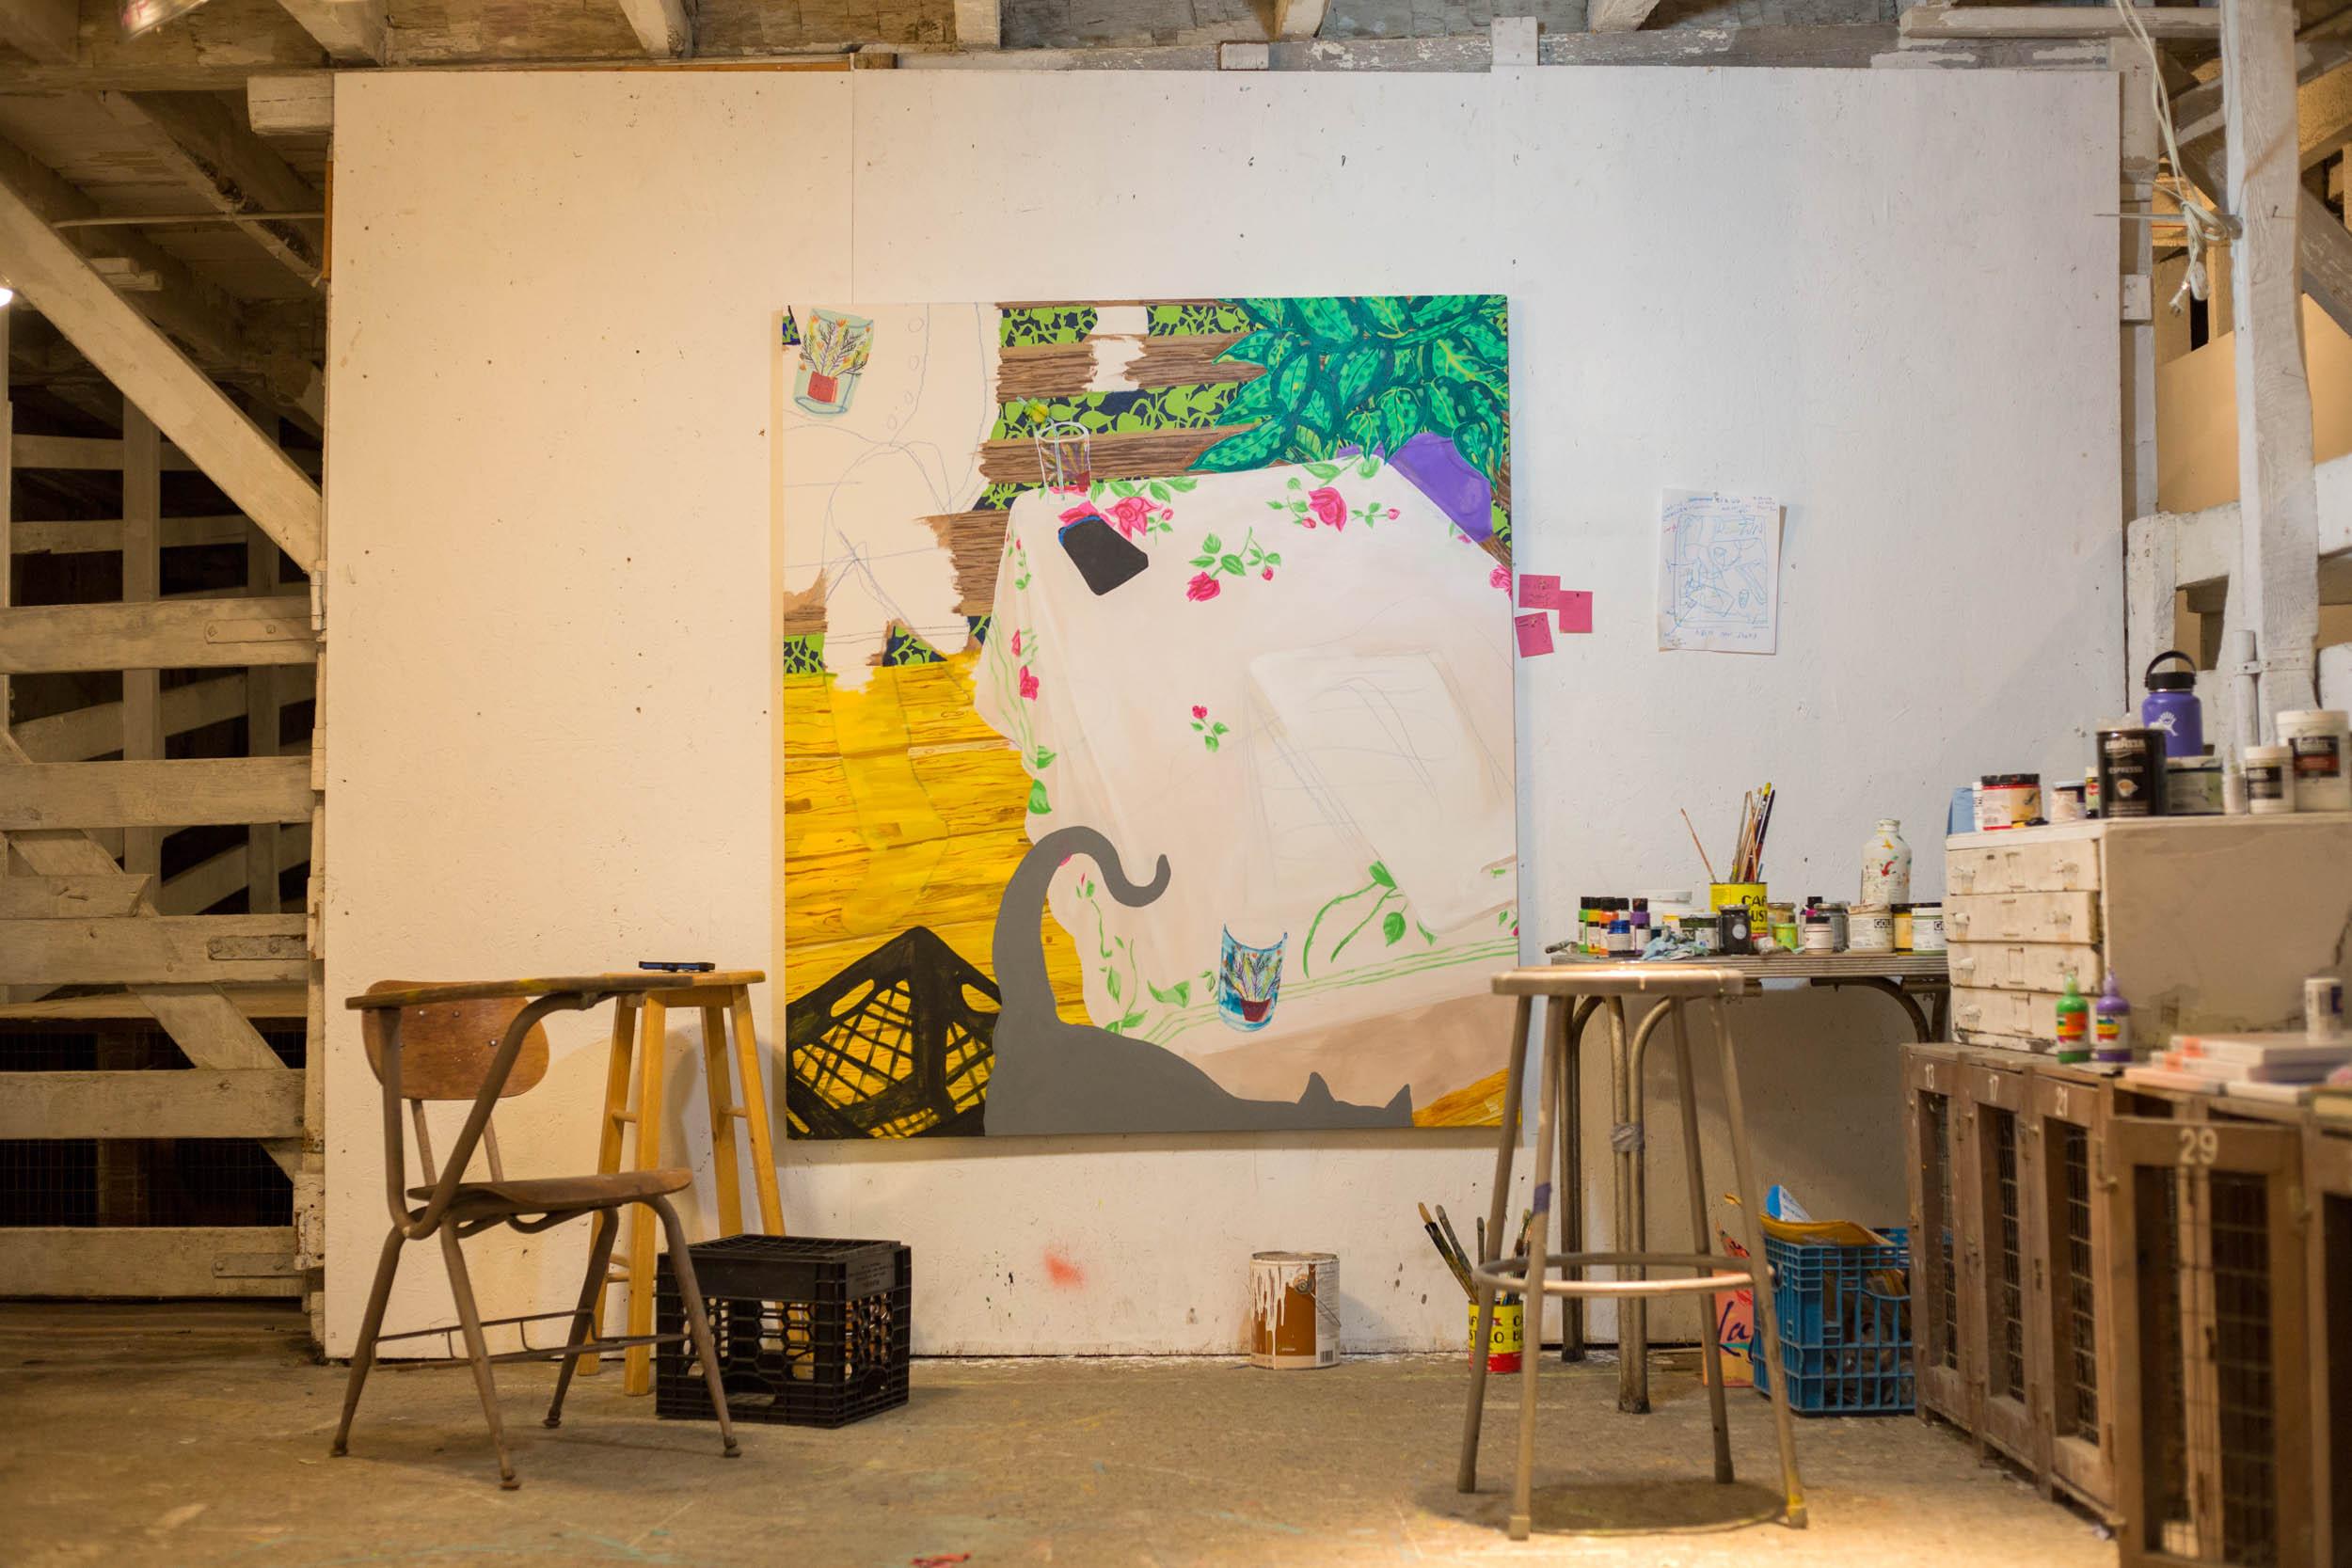 wassaic-project-artist-nicole-dyer-2018-09-13-13-46-56.jpg